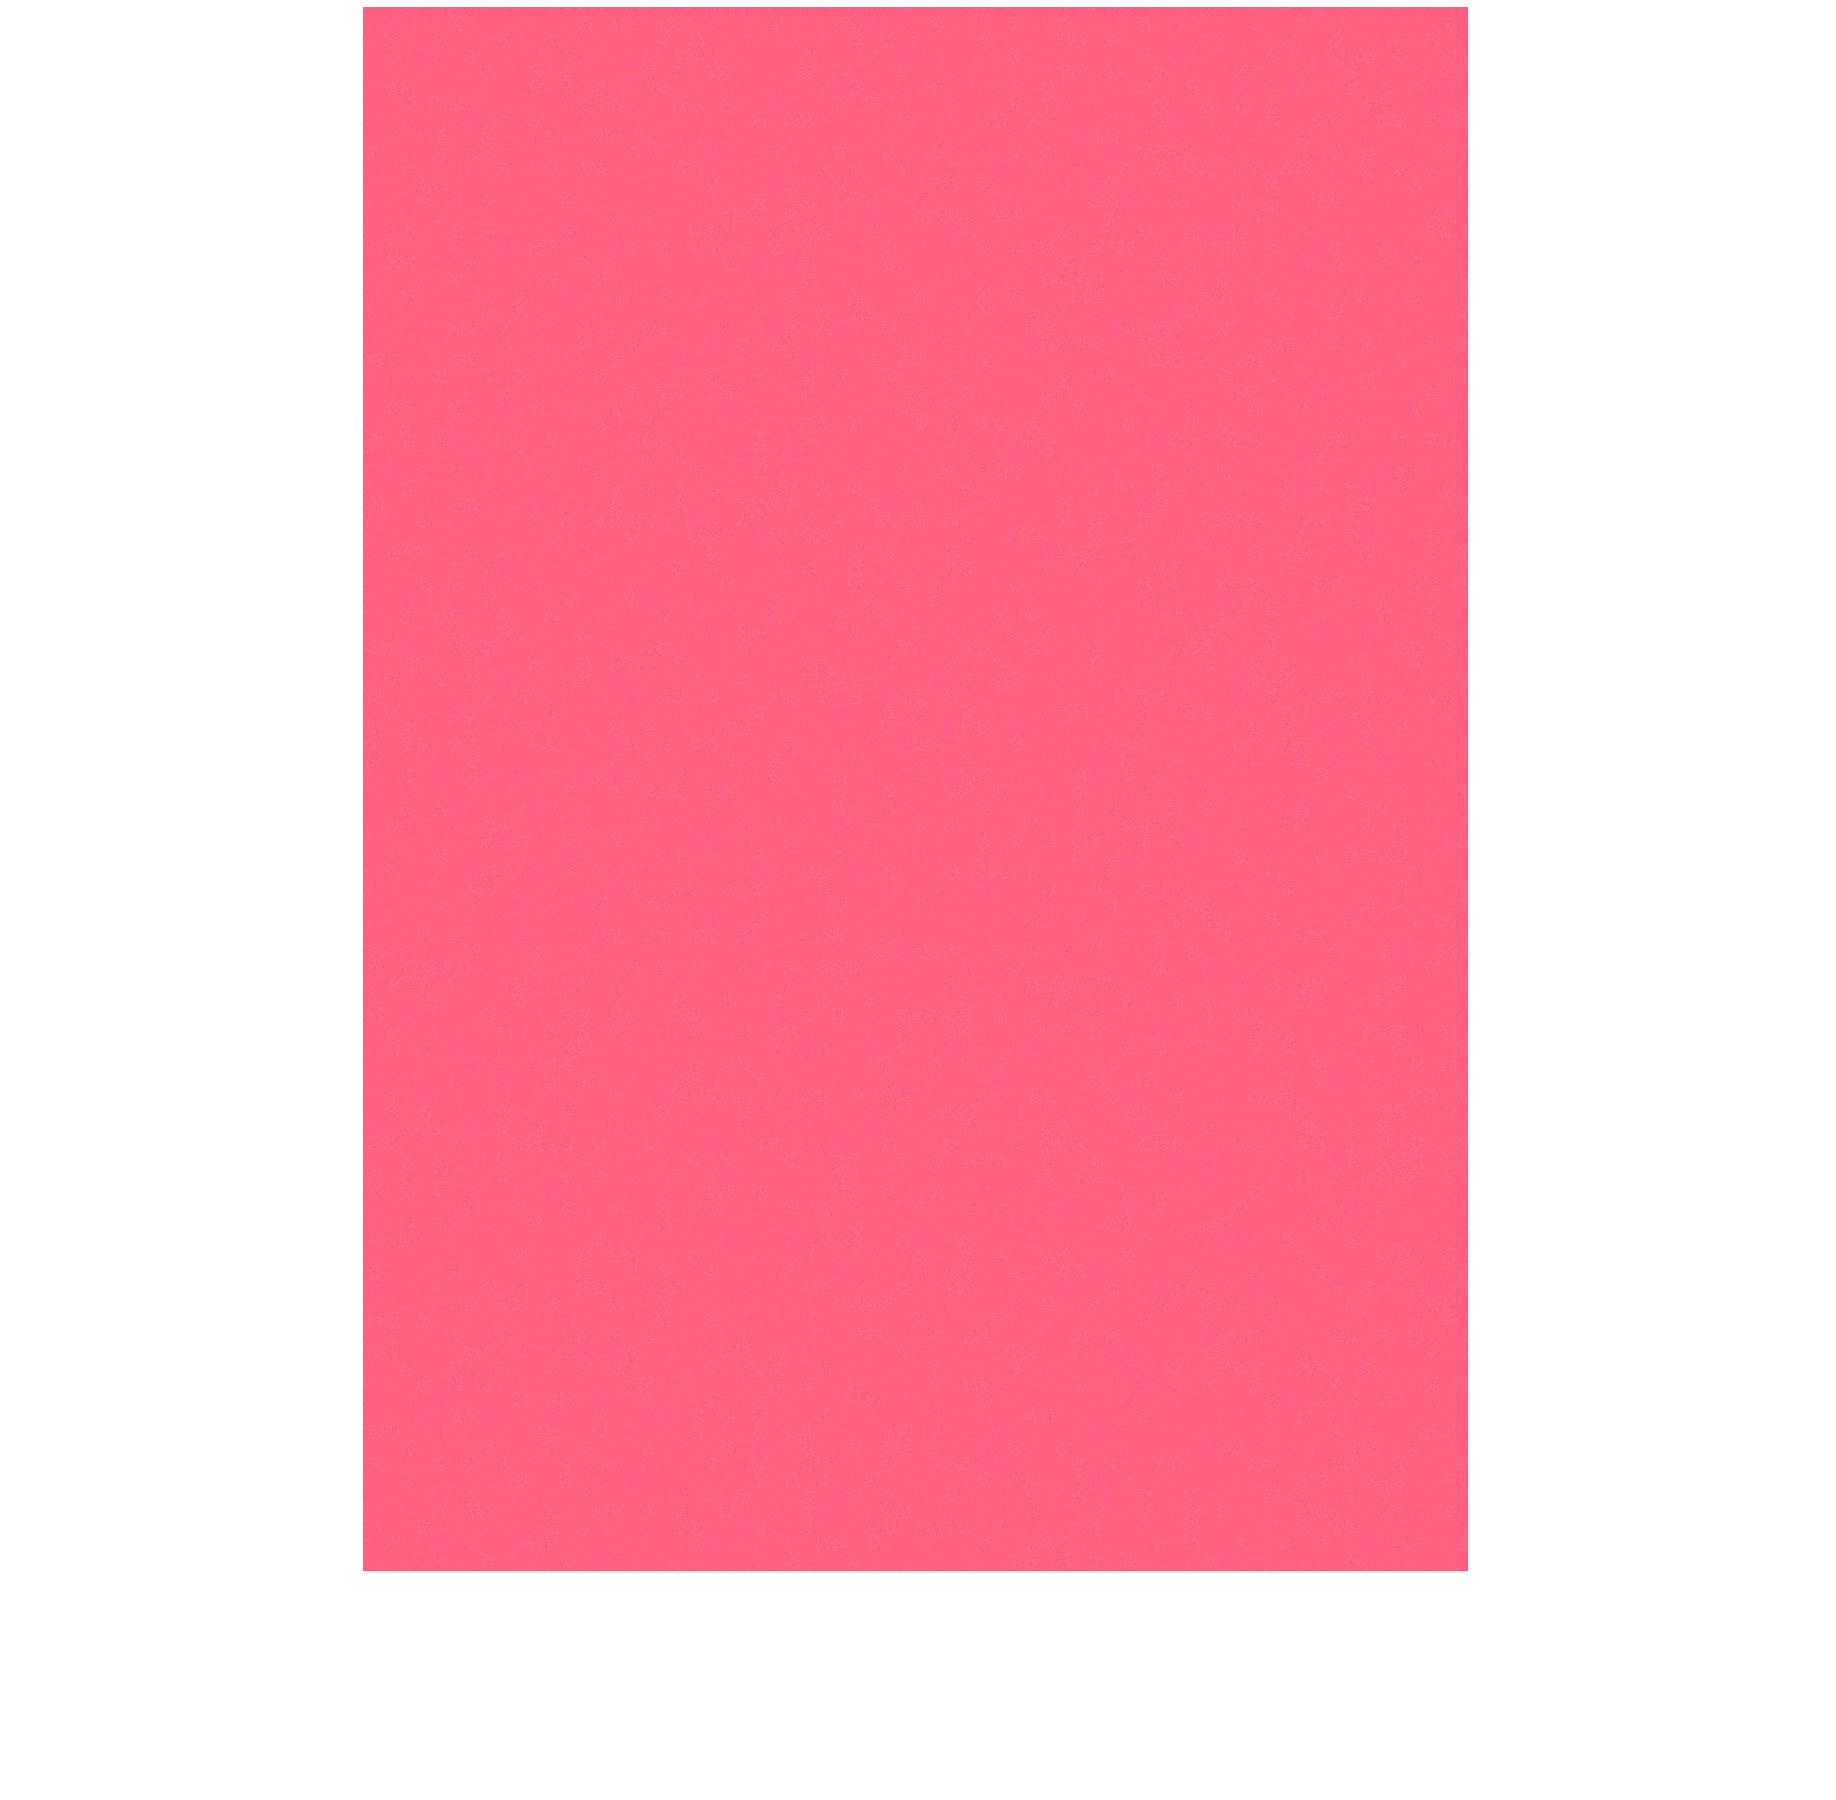 Karton kolor A1 różowy Interdruk 11